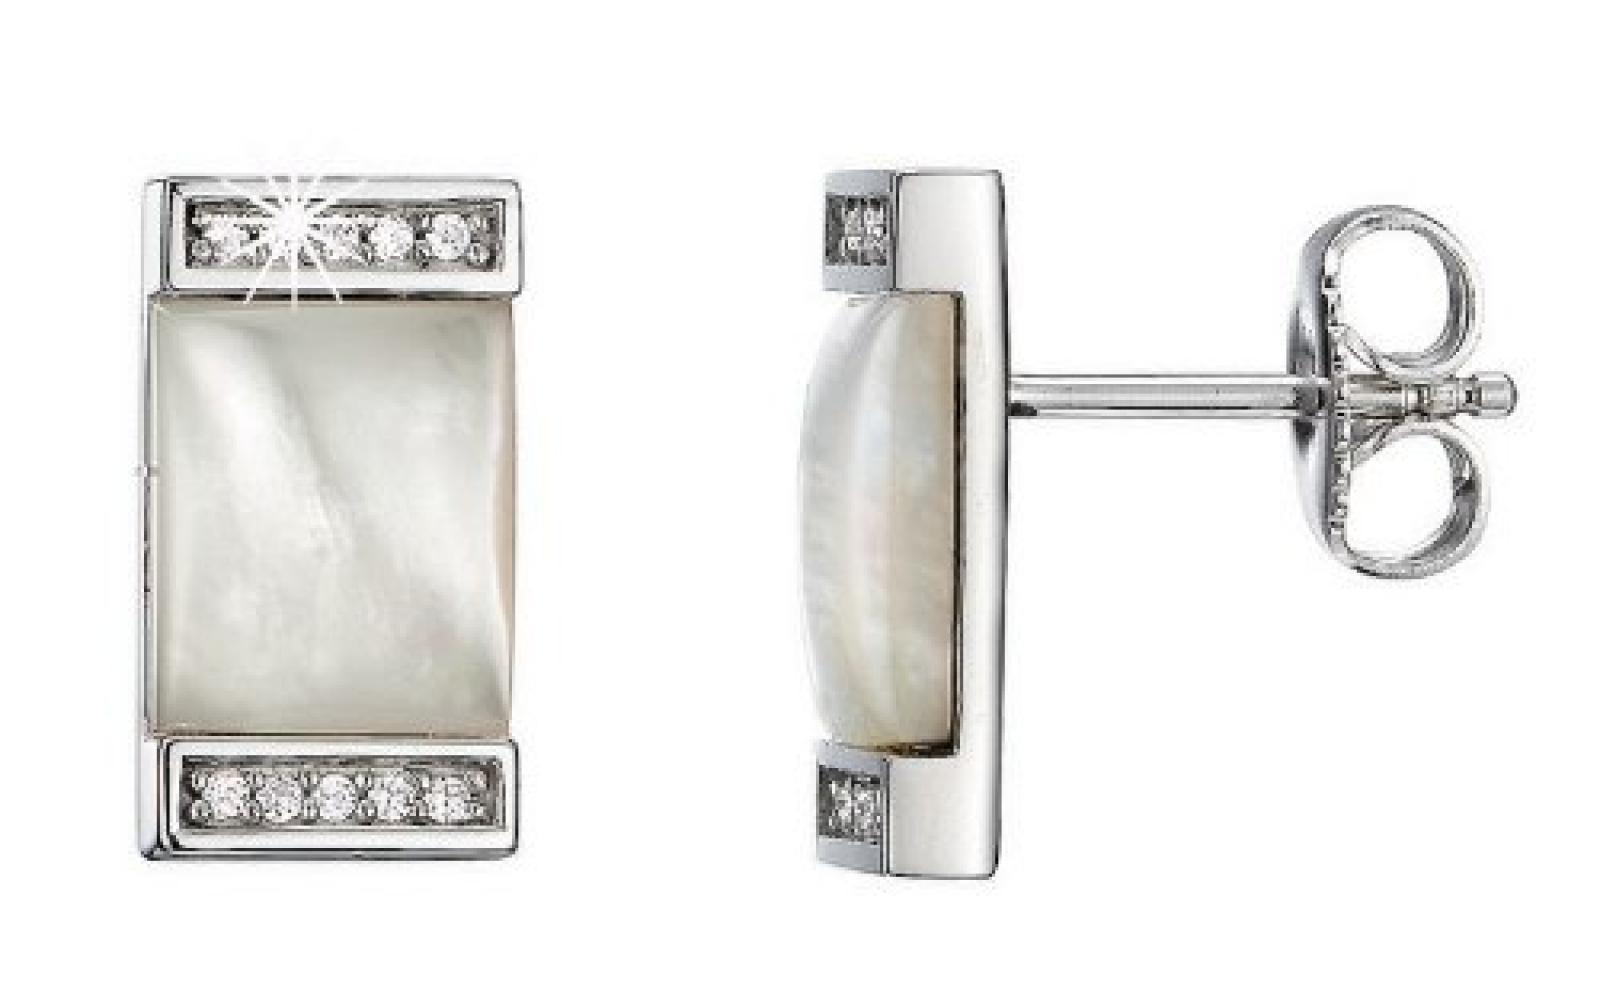 Pierre Cardin Damen-Ohrstecker 925 Sterling Silber rhodiniert Kristall Zirkonia Crépuscule weiß PCER90209B000